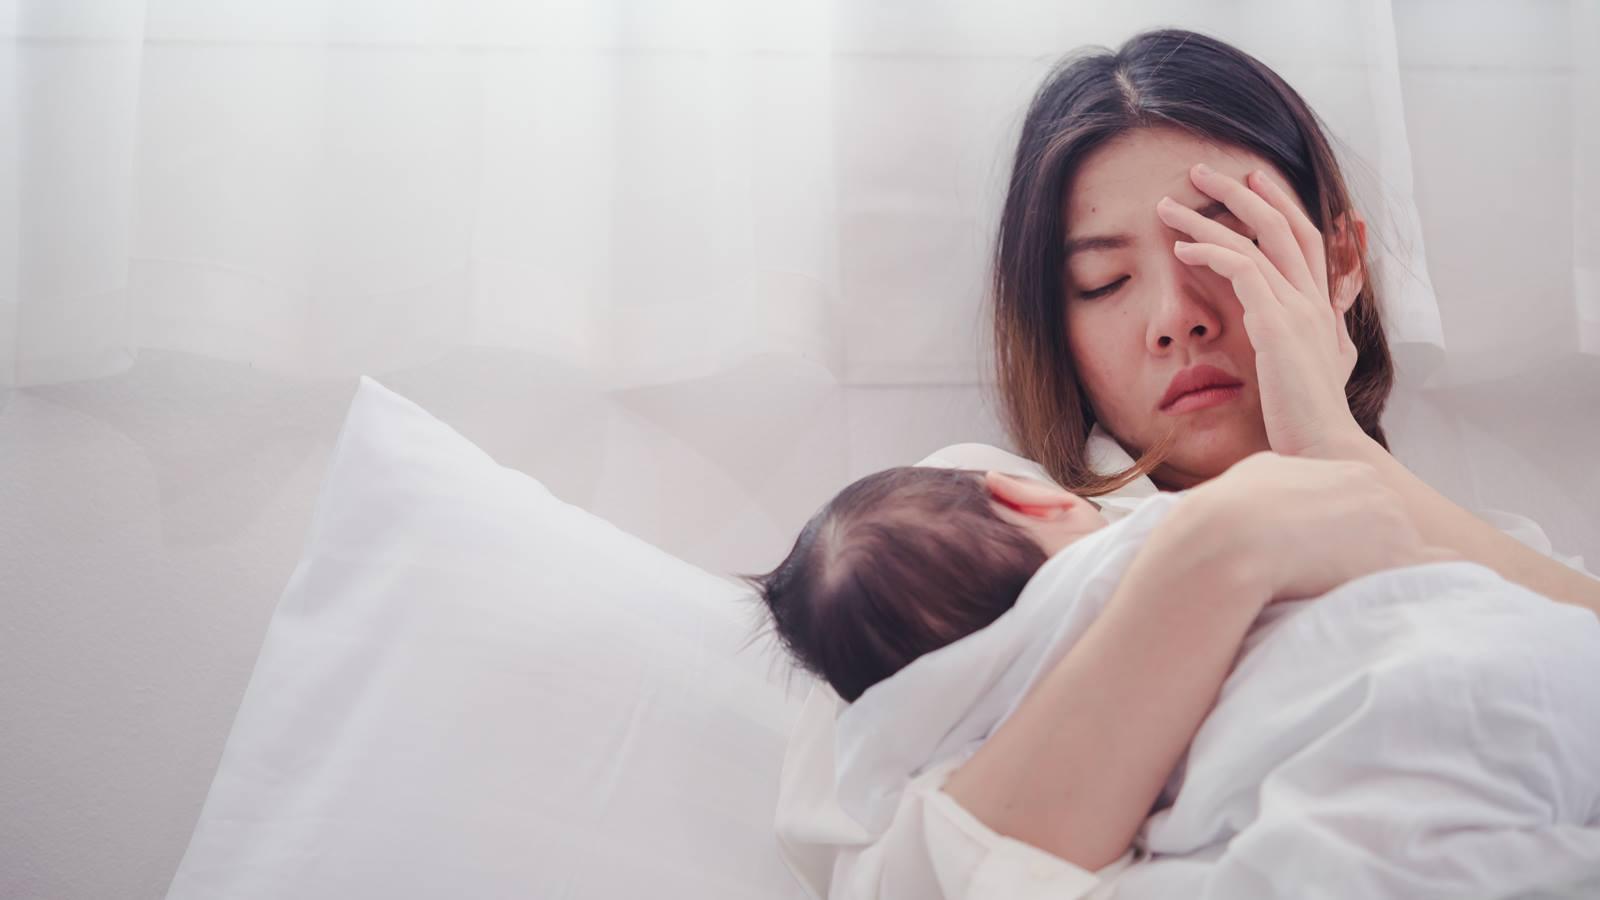 Postpartum depression amid the COVID-19 pandemic